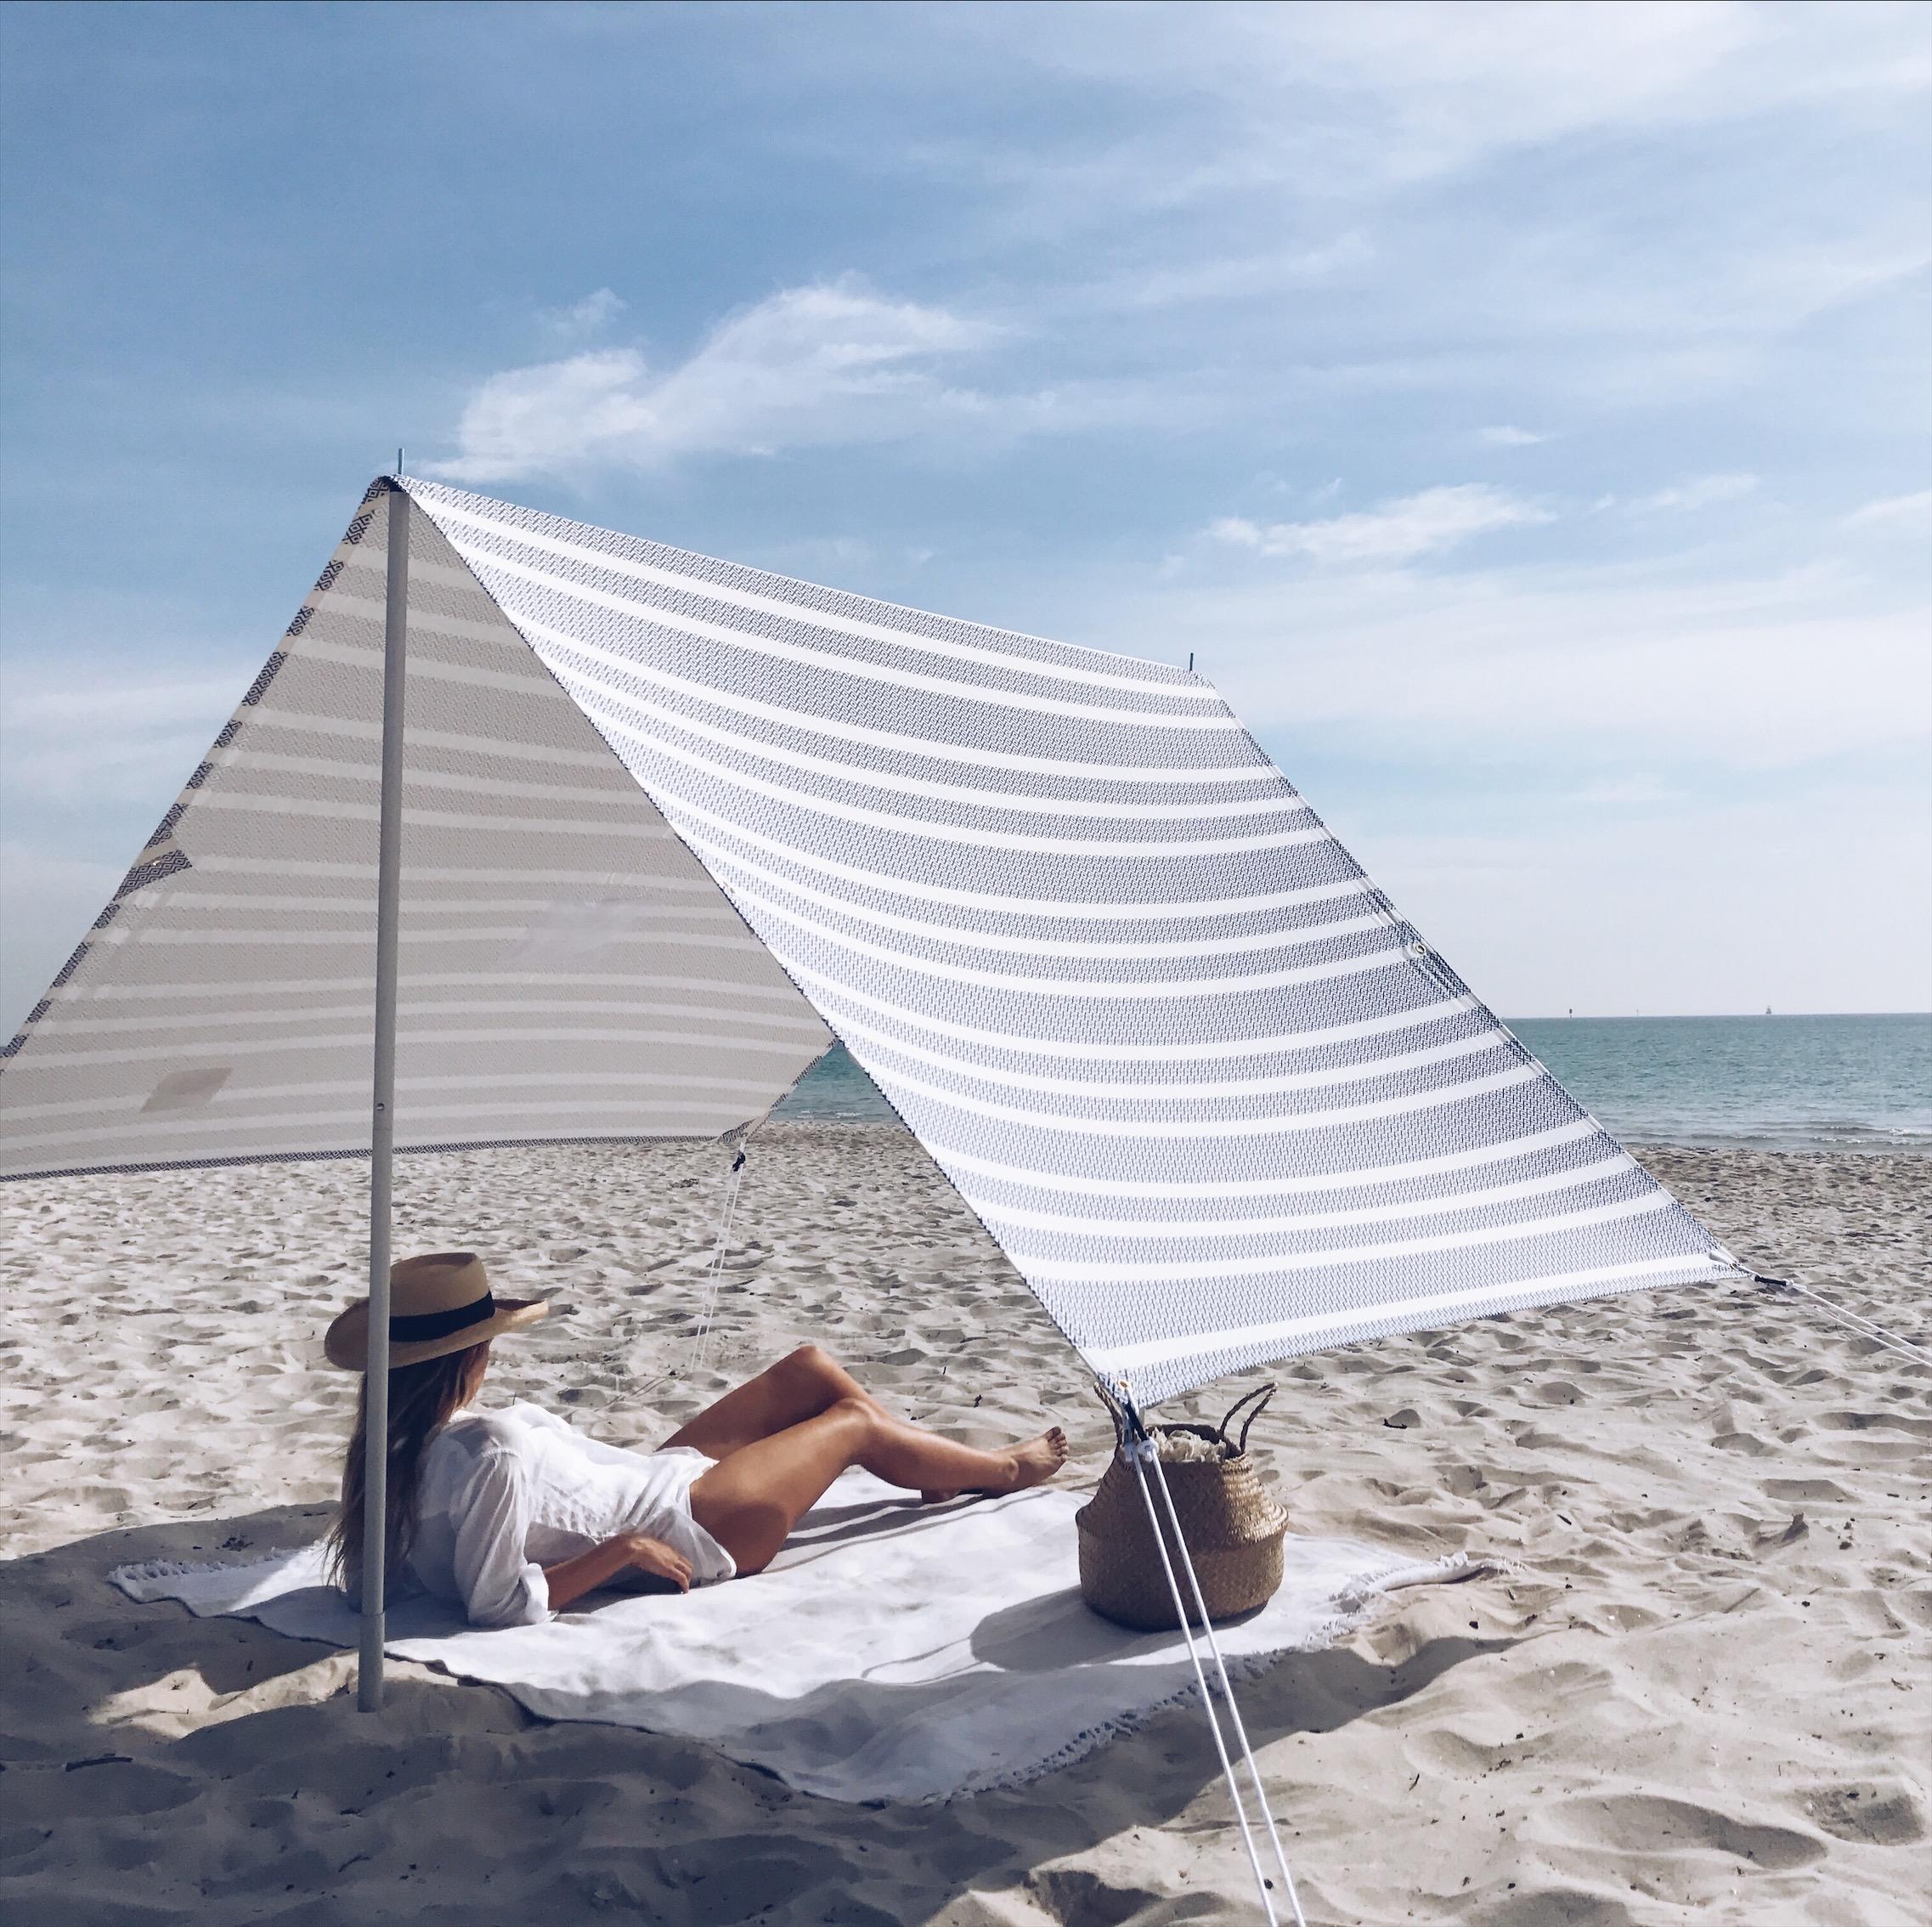 ... tent Best beach shade in Australia ... & Santorini Beach Tent | Lovin Summer | Chase the sun in style